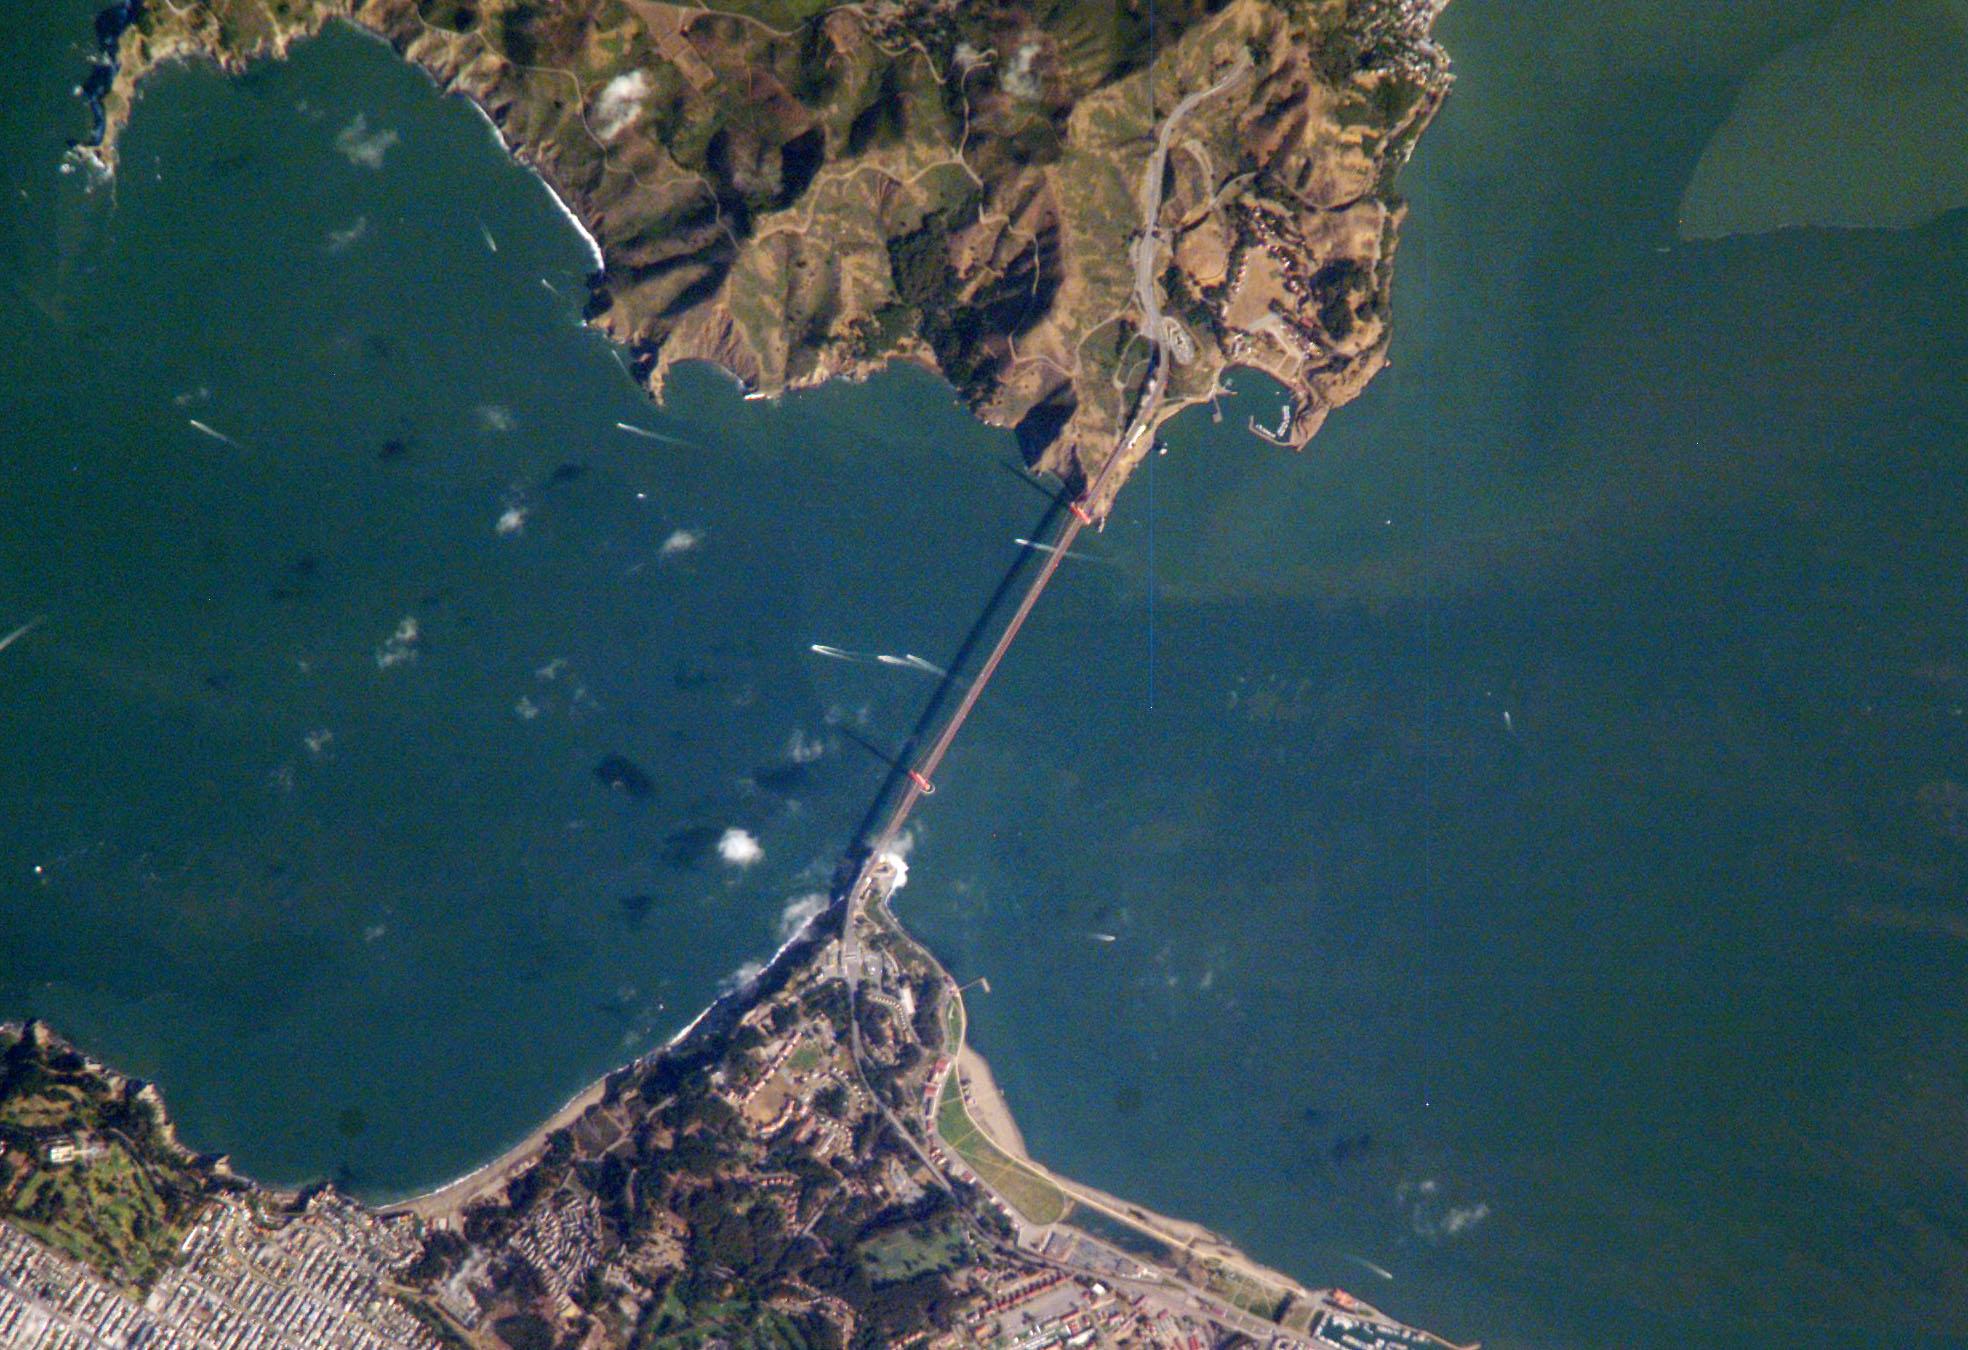 Iss Hd Wallpaper Nasa Visible Earth Golden Gate San Francisco California